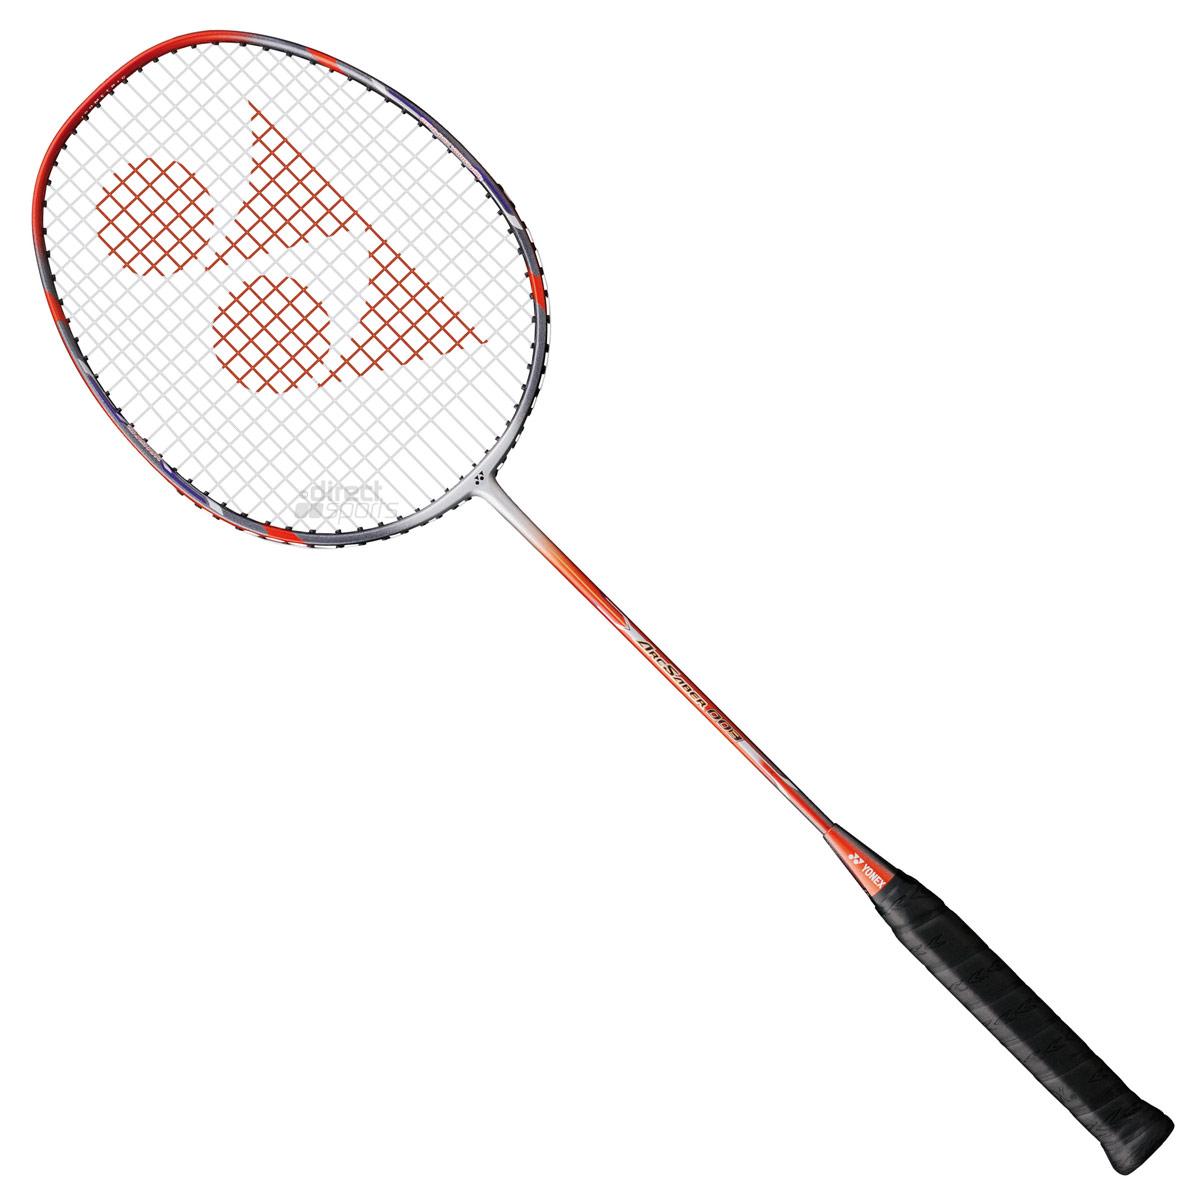 badminton shuttlecock and racket Badminton equipment sale great prices & fast delivery yonex, victor, carlton, yehlex, apacs, asics & more leading uk badminton retailer.